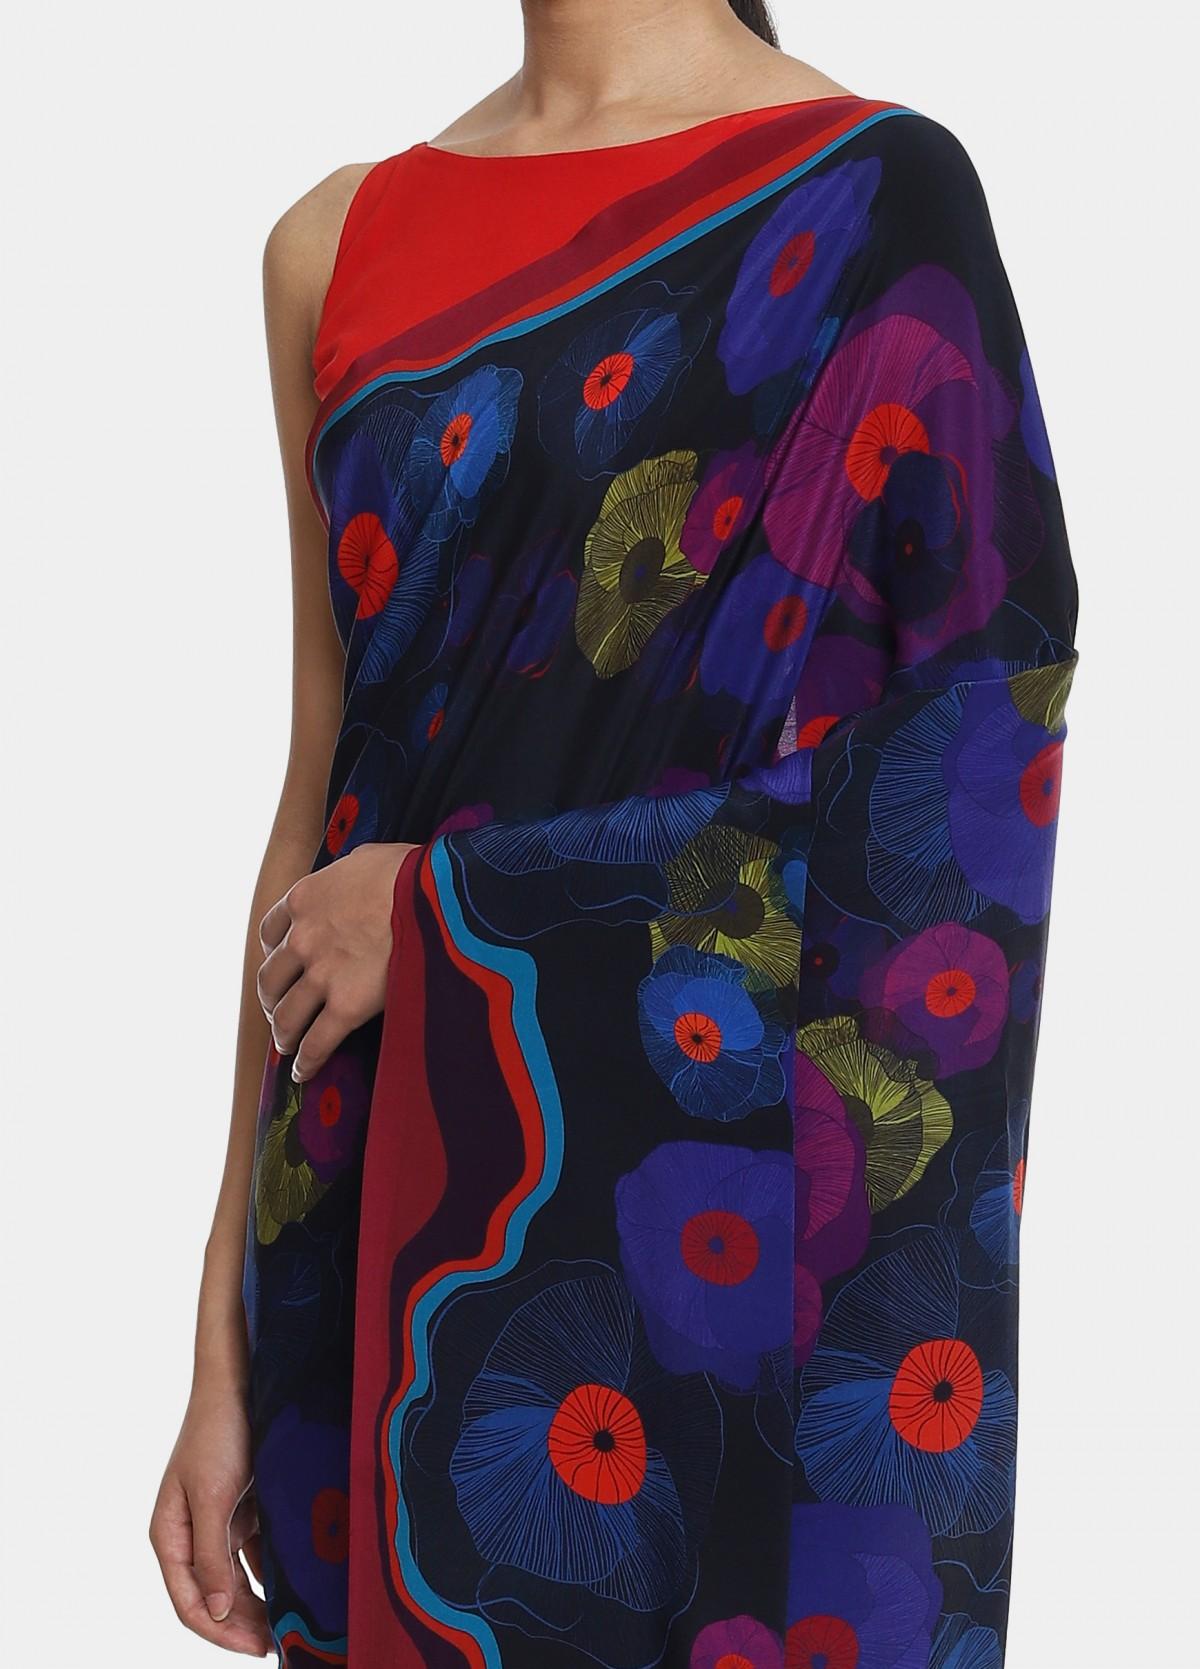 The Sandy Sari